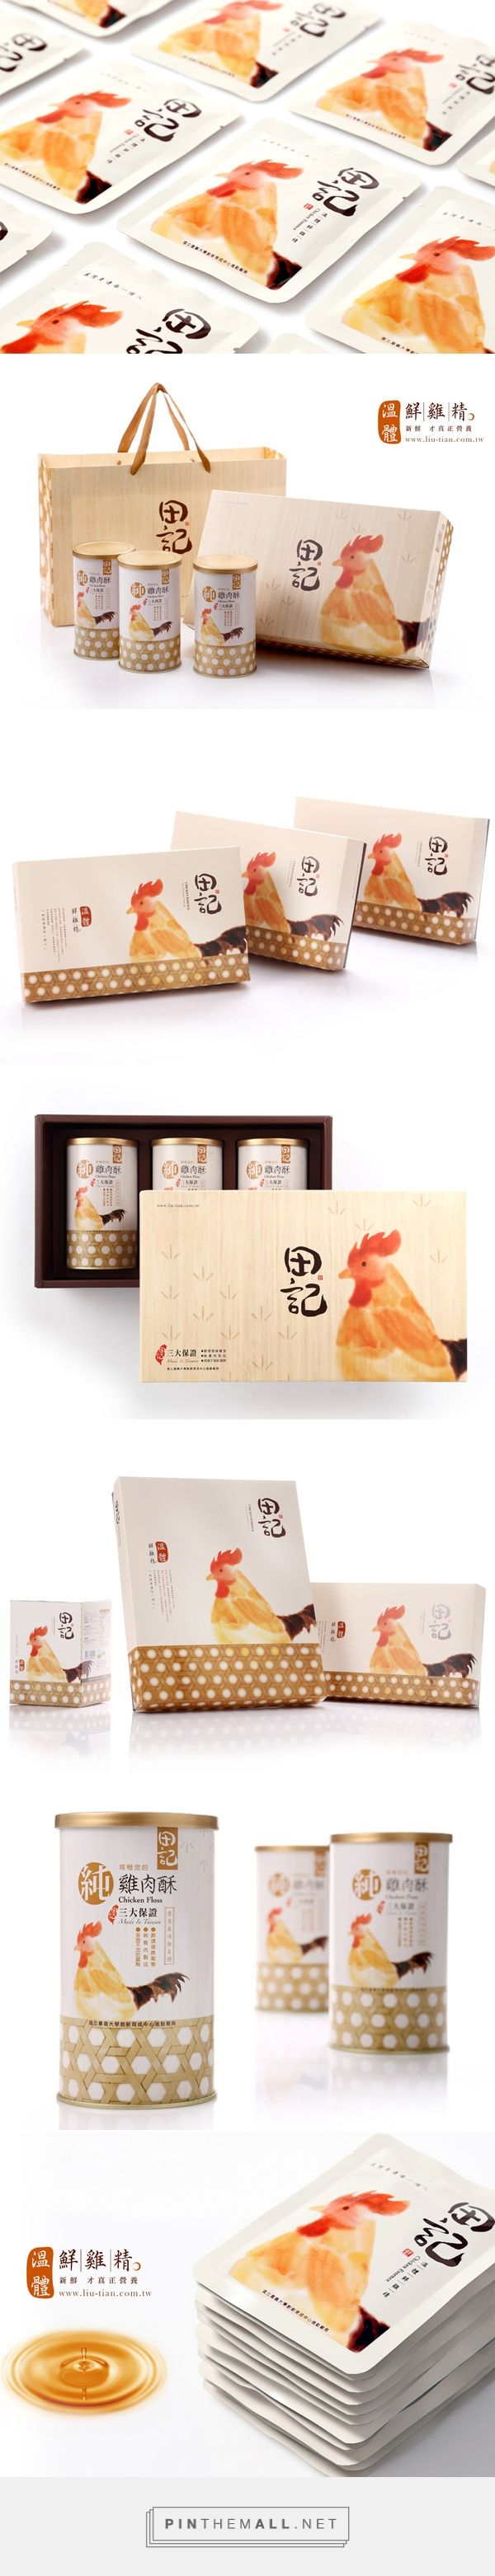 田記滴雞精包裝設計 存在設計 @ Design Group curated by Packaging Diva PD. Chicken Essence packaging.